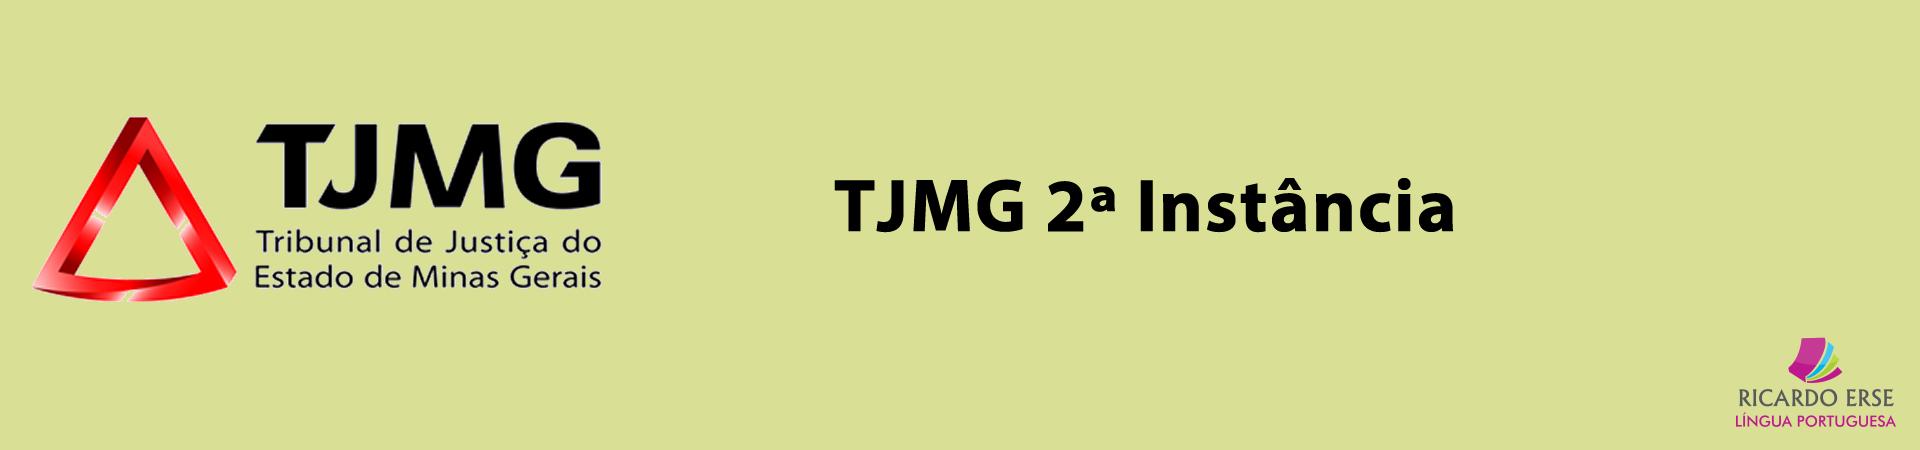 TJMG 2ª Instância